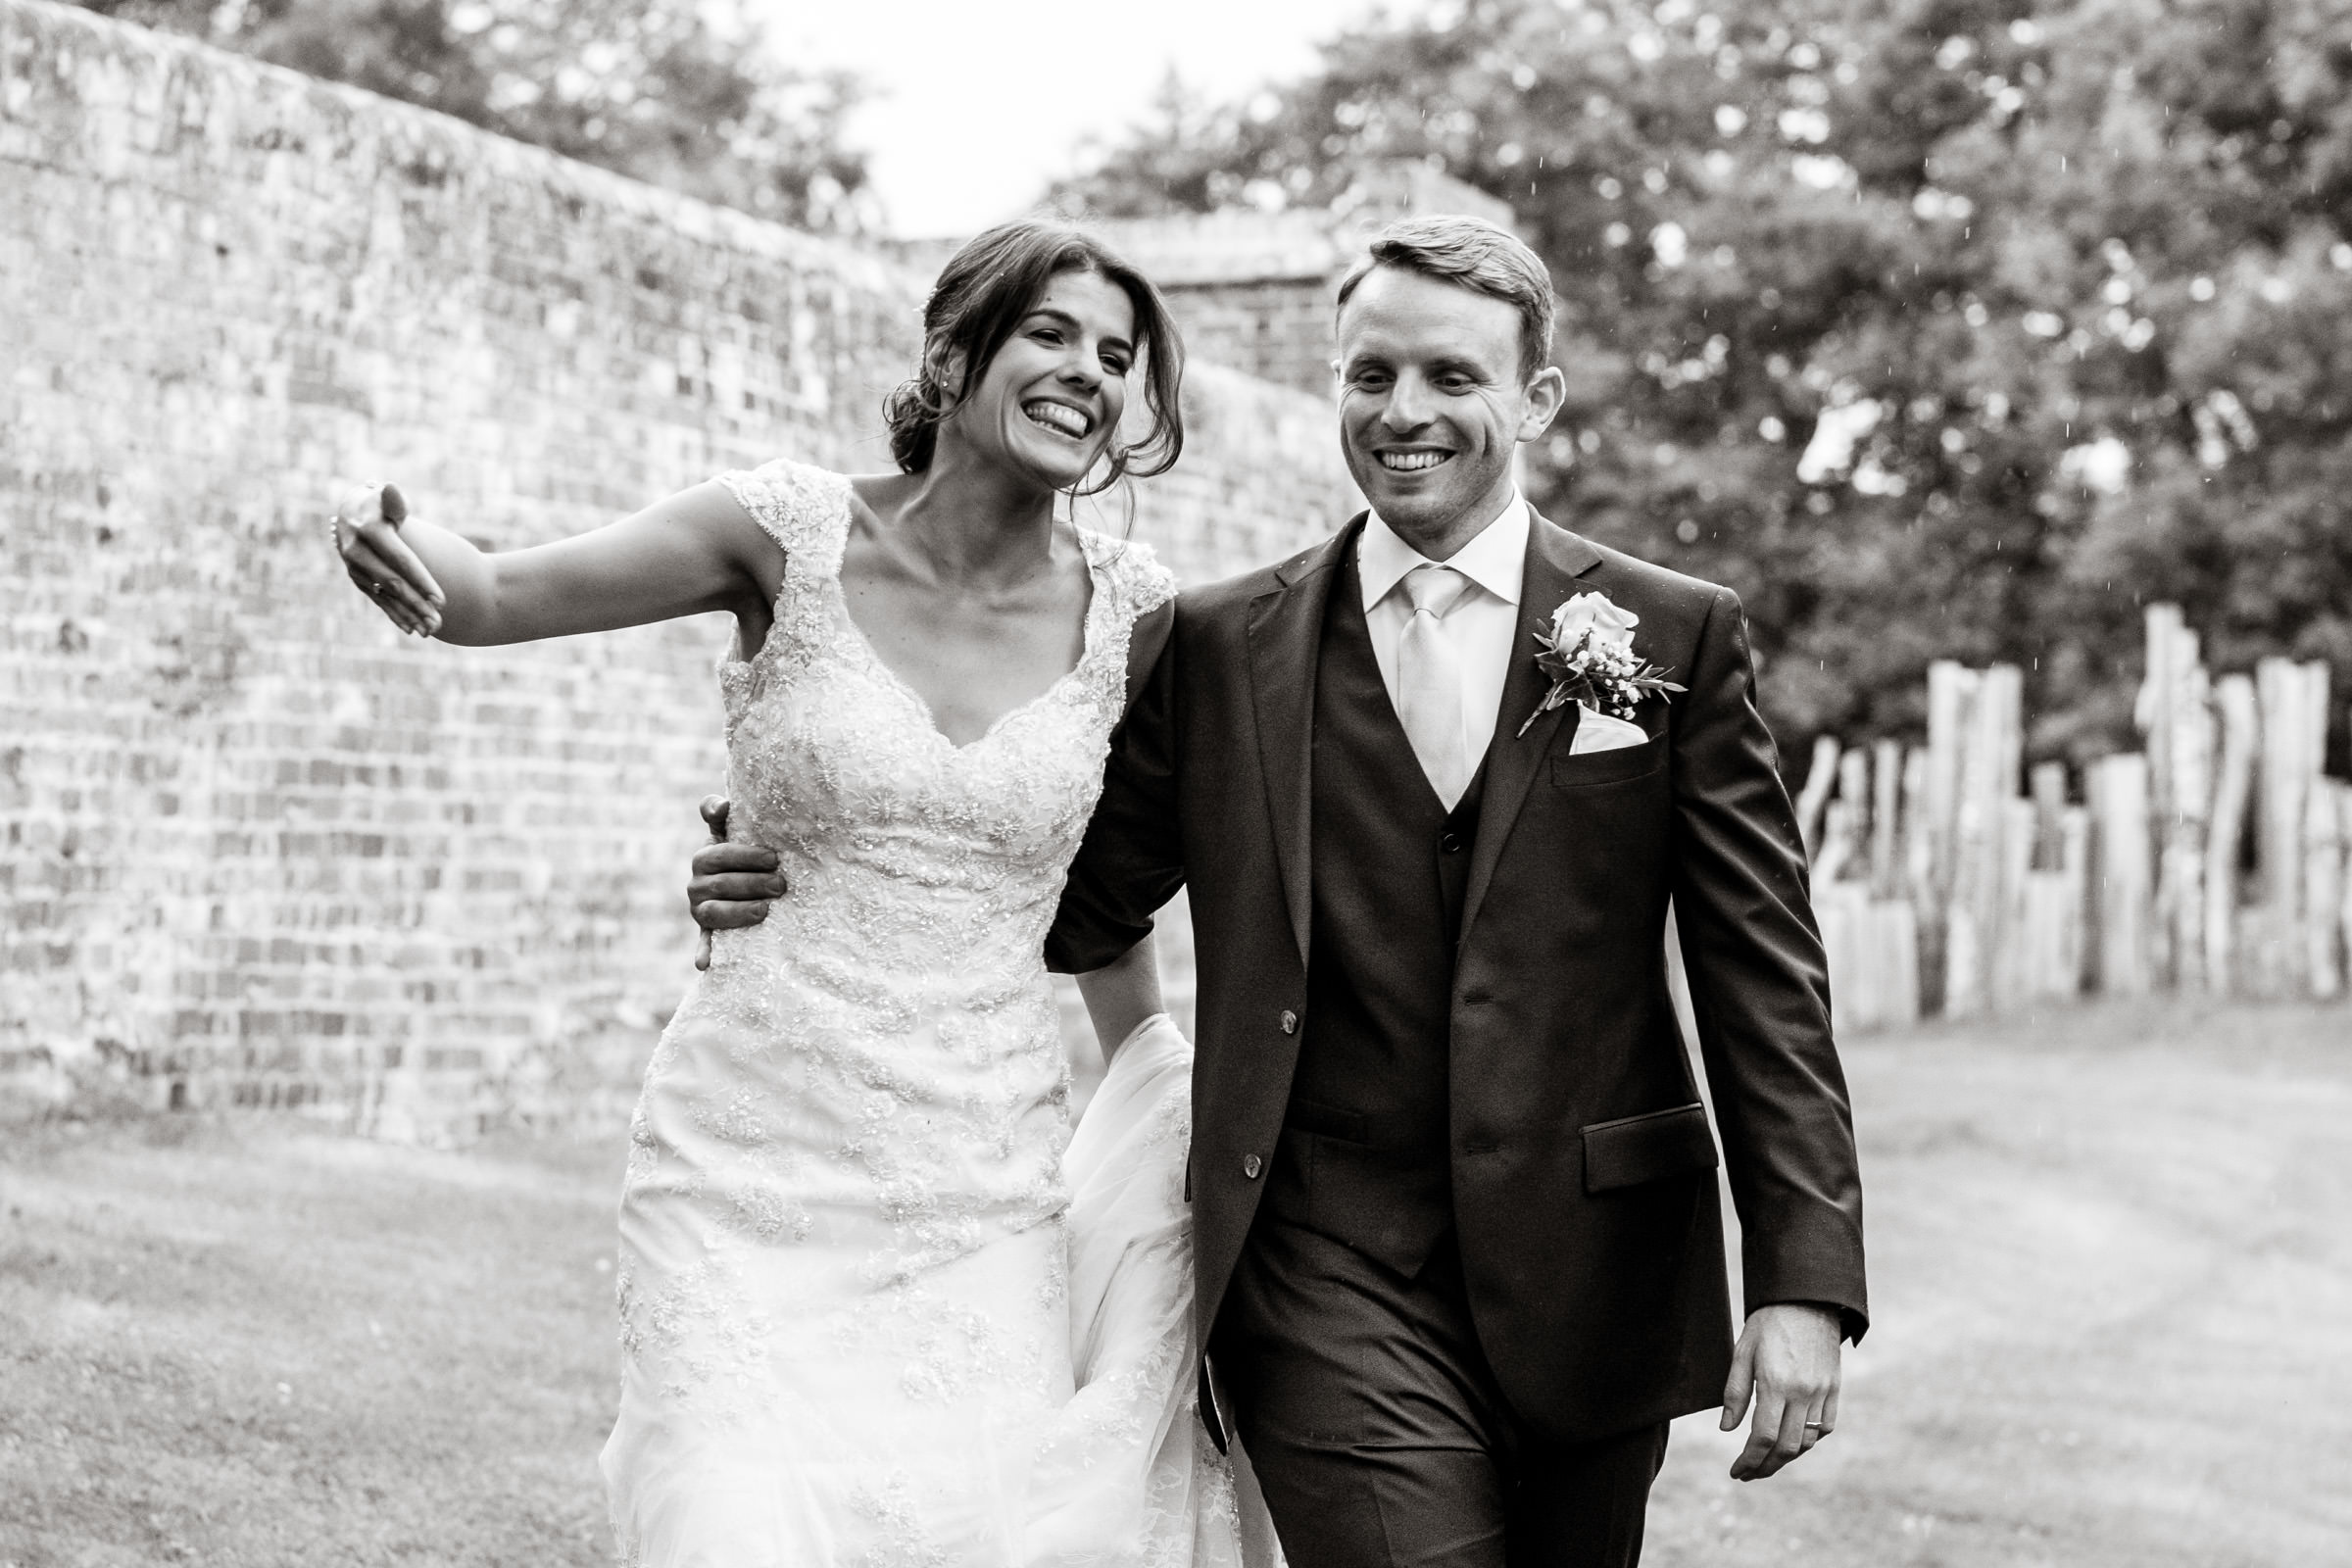 Natural+wedding+photography+portfolio+120.jpg